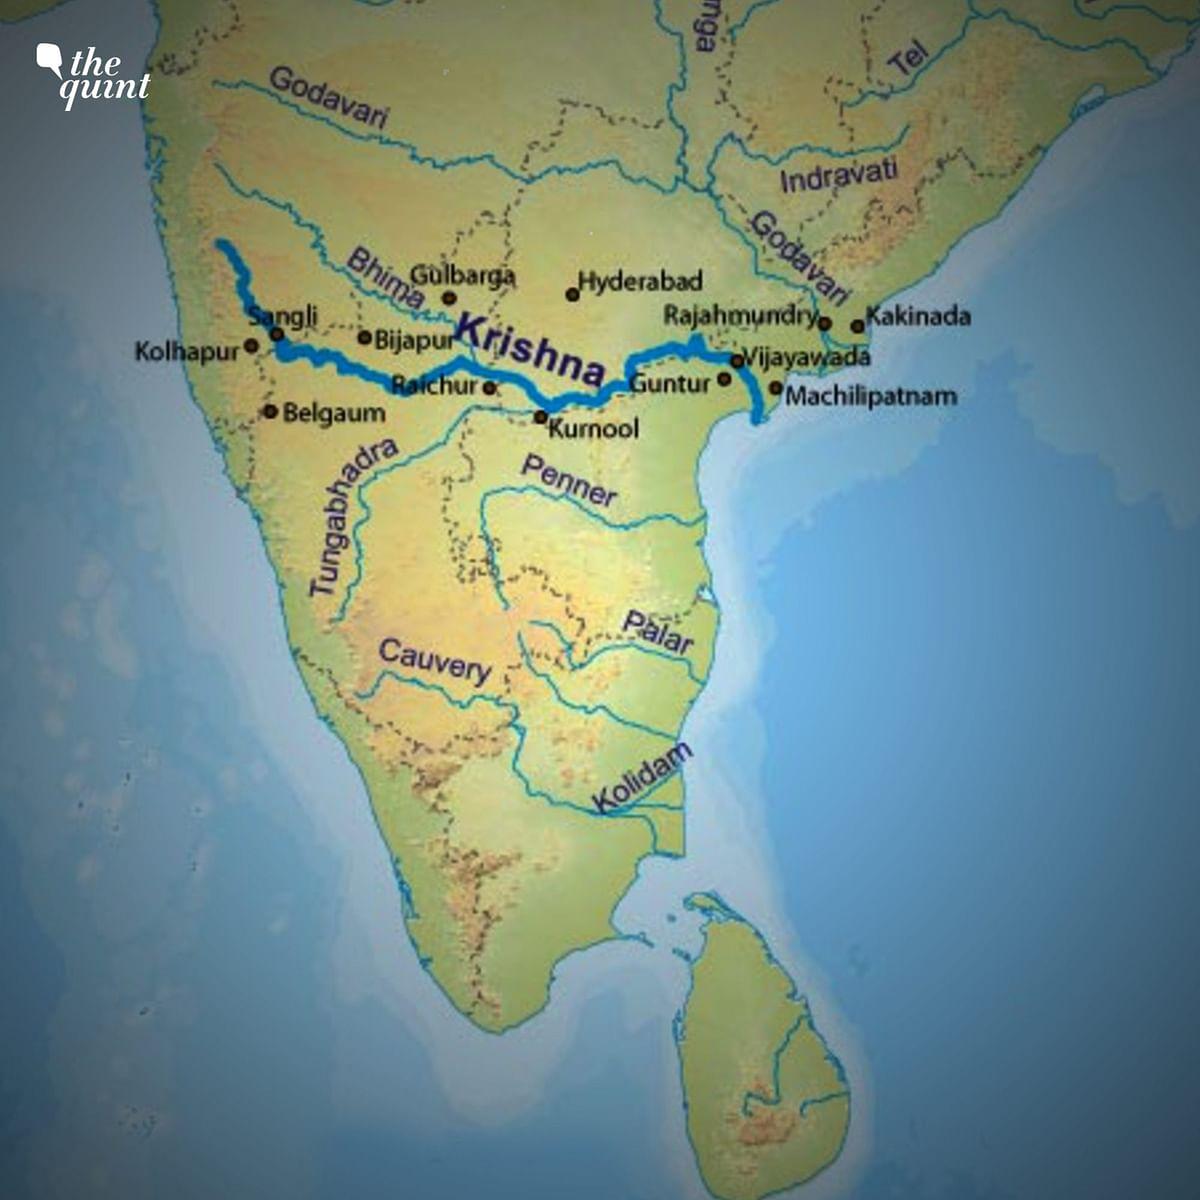 "<div class=""paragraphs""><p>Krishna river flows through Maharashtra, Telangana and Andhra Pradesh.</p></div>"